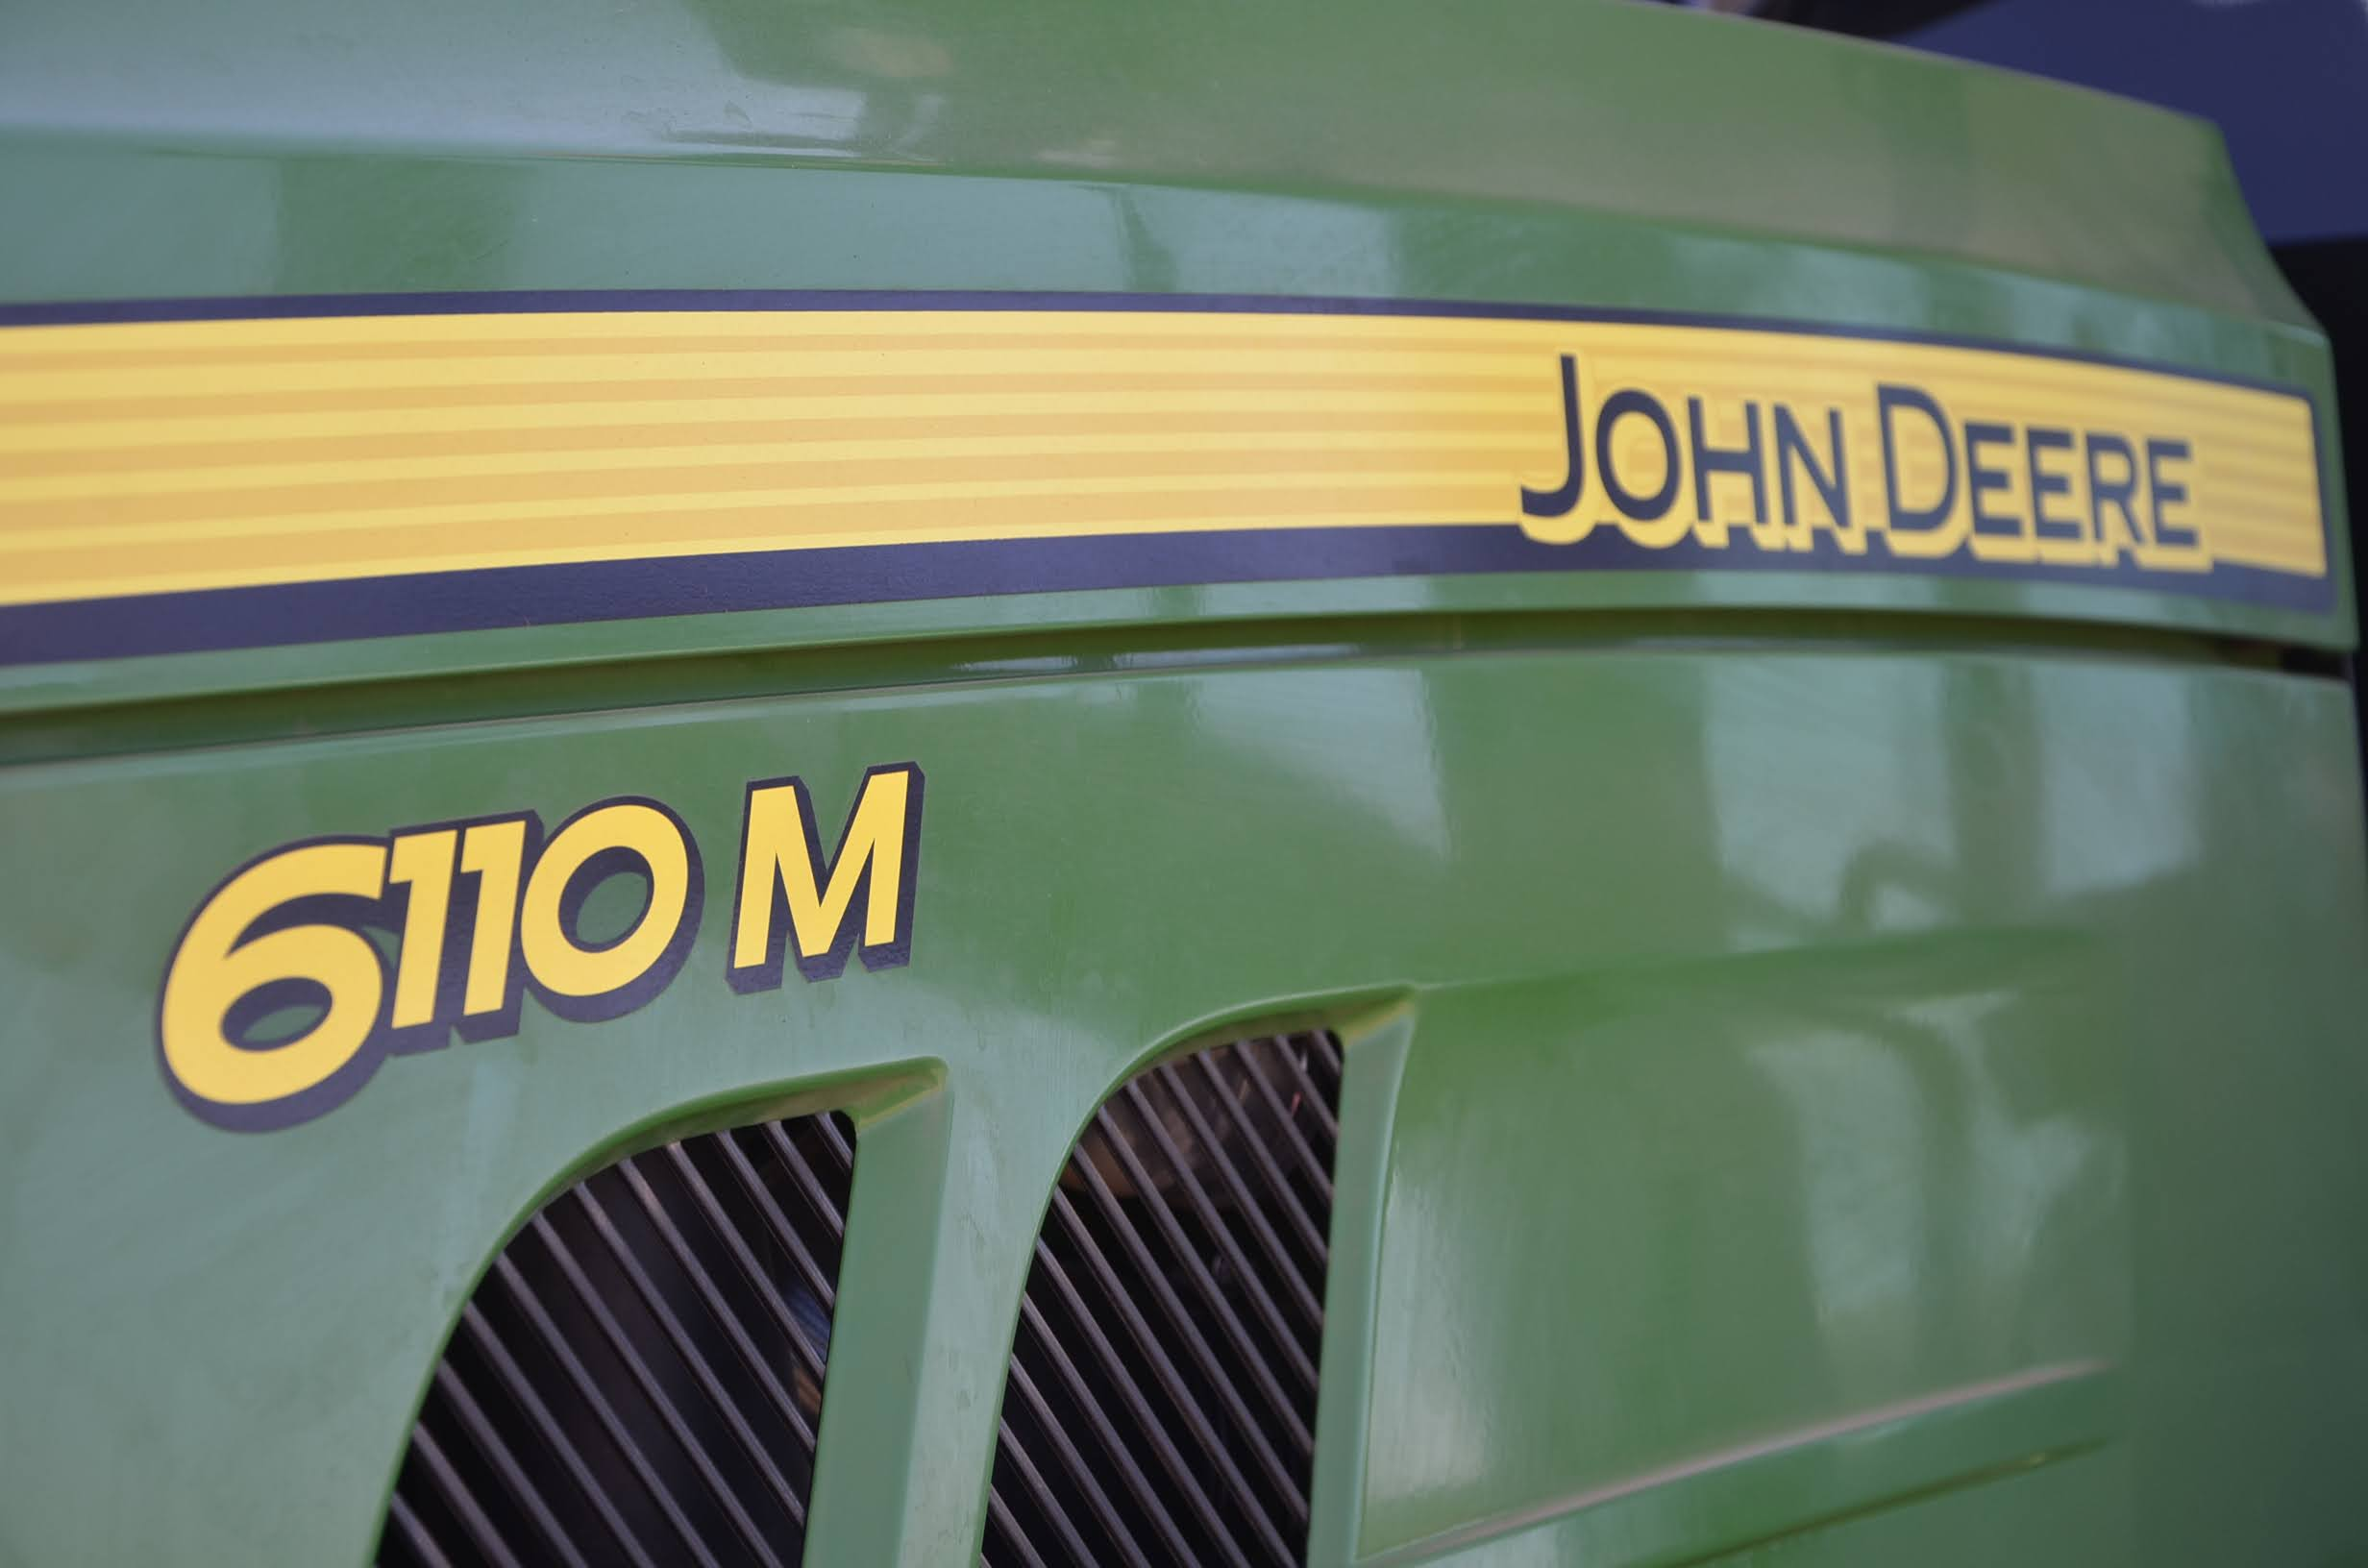 JohnDeere_6110M-04